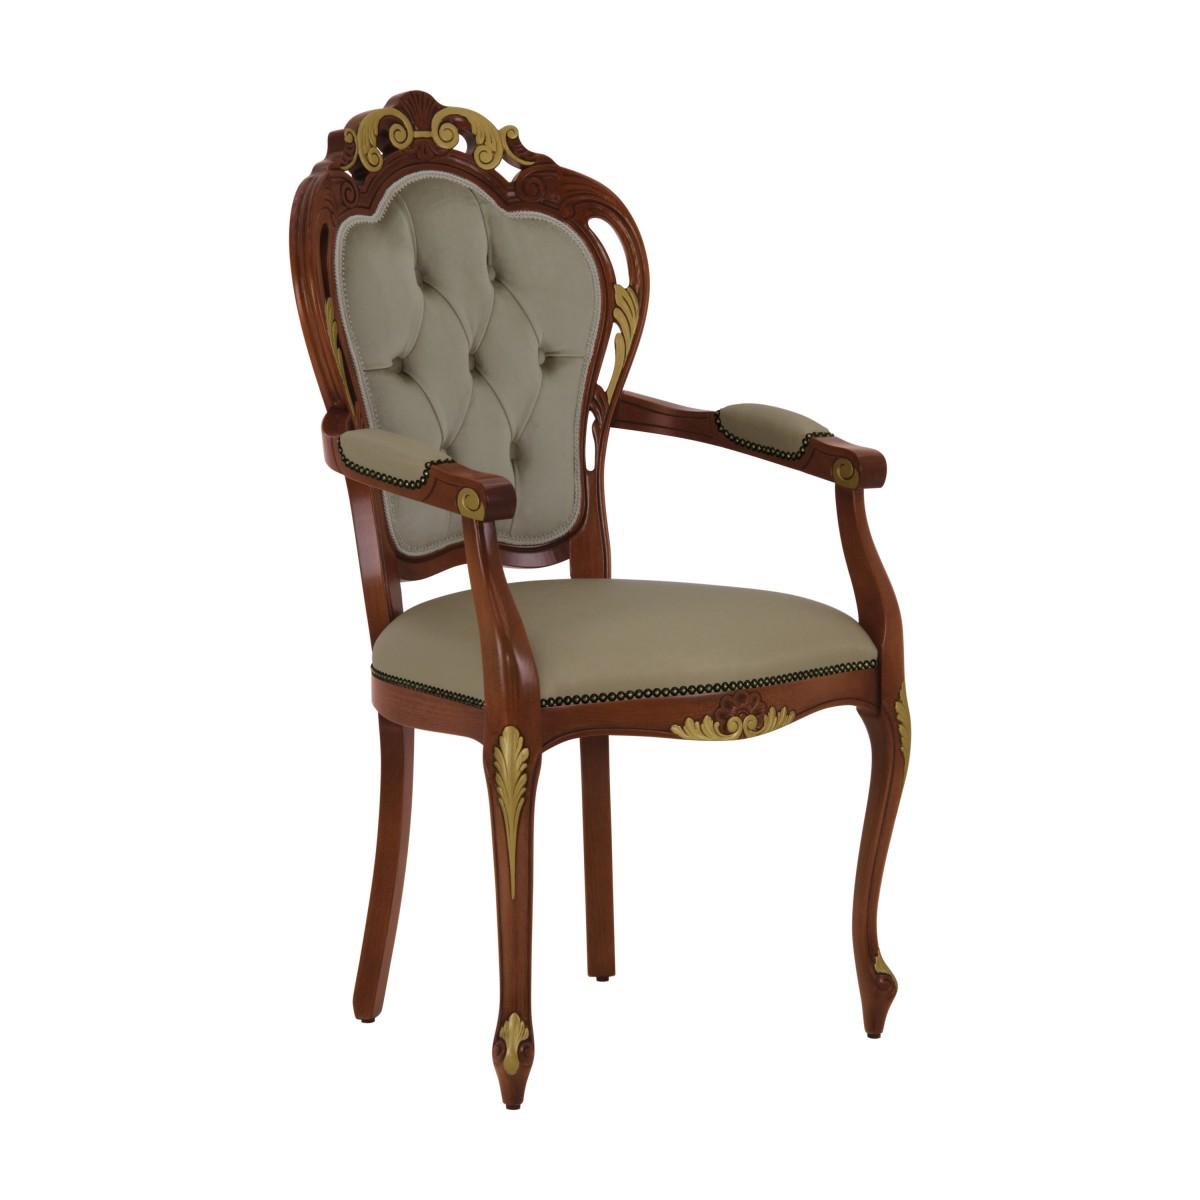 replica armchair traforata 6636